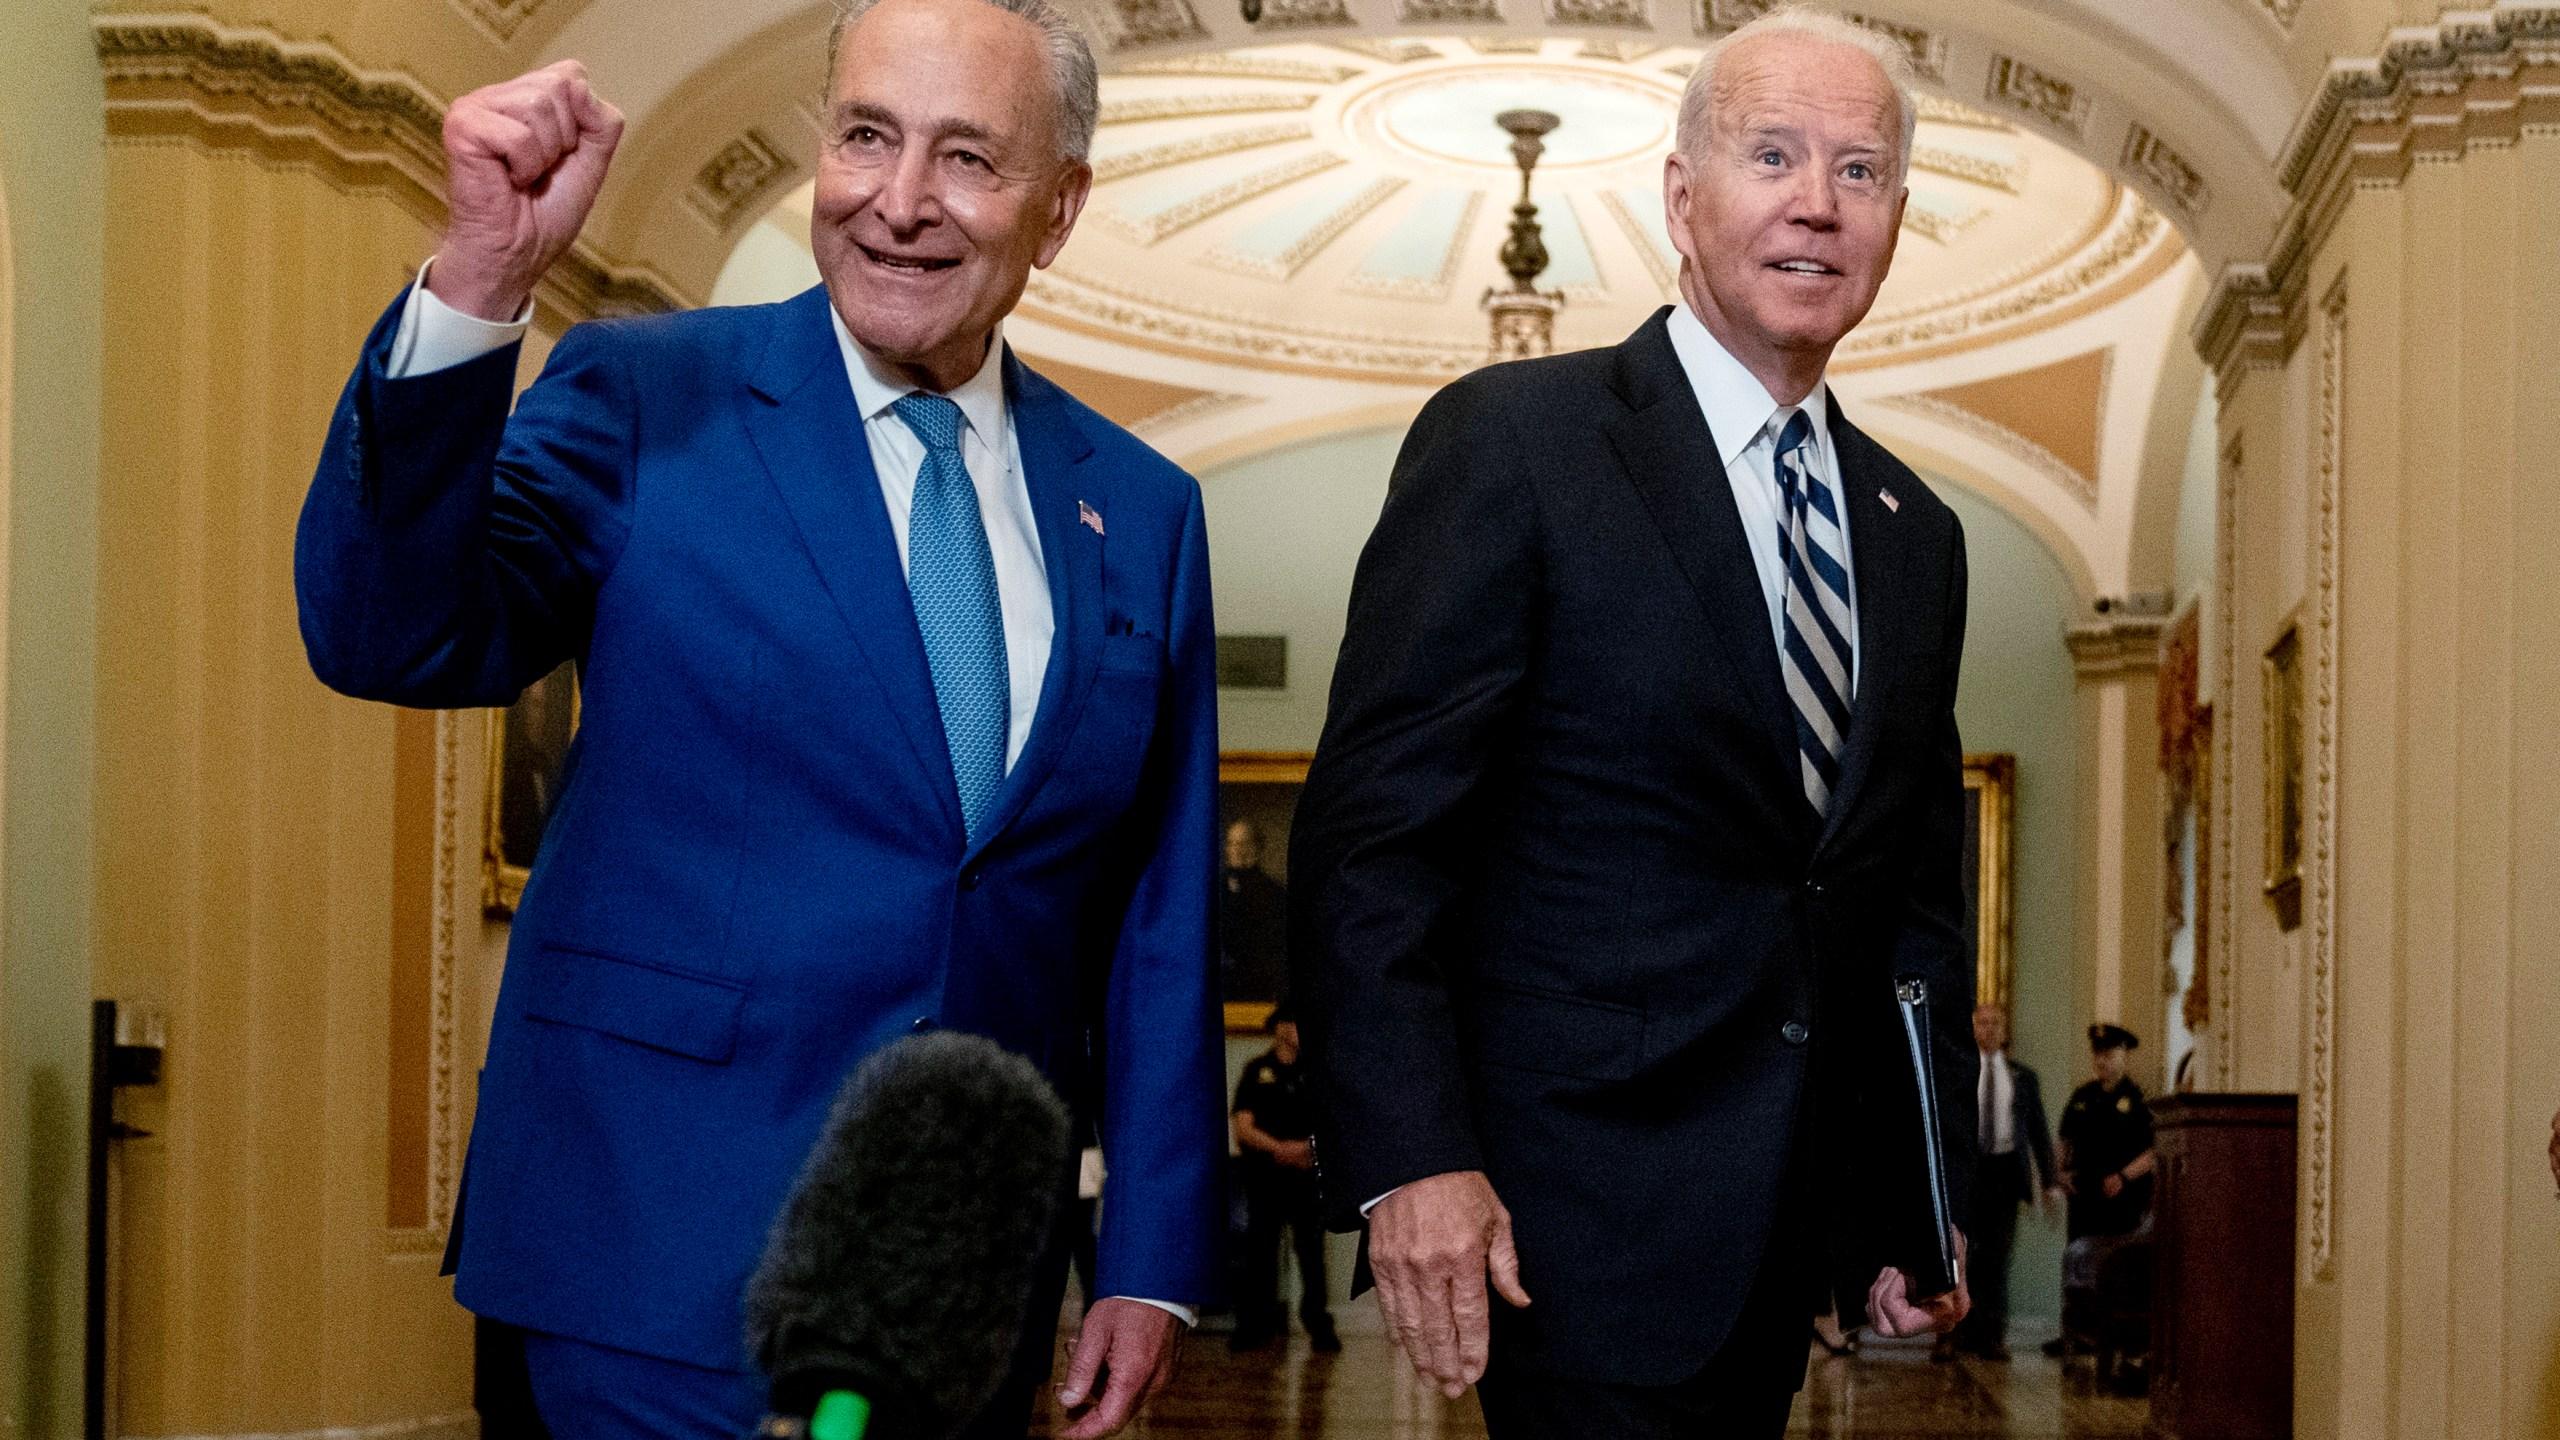 Joe Biden, Chuck Schumer